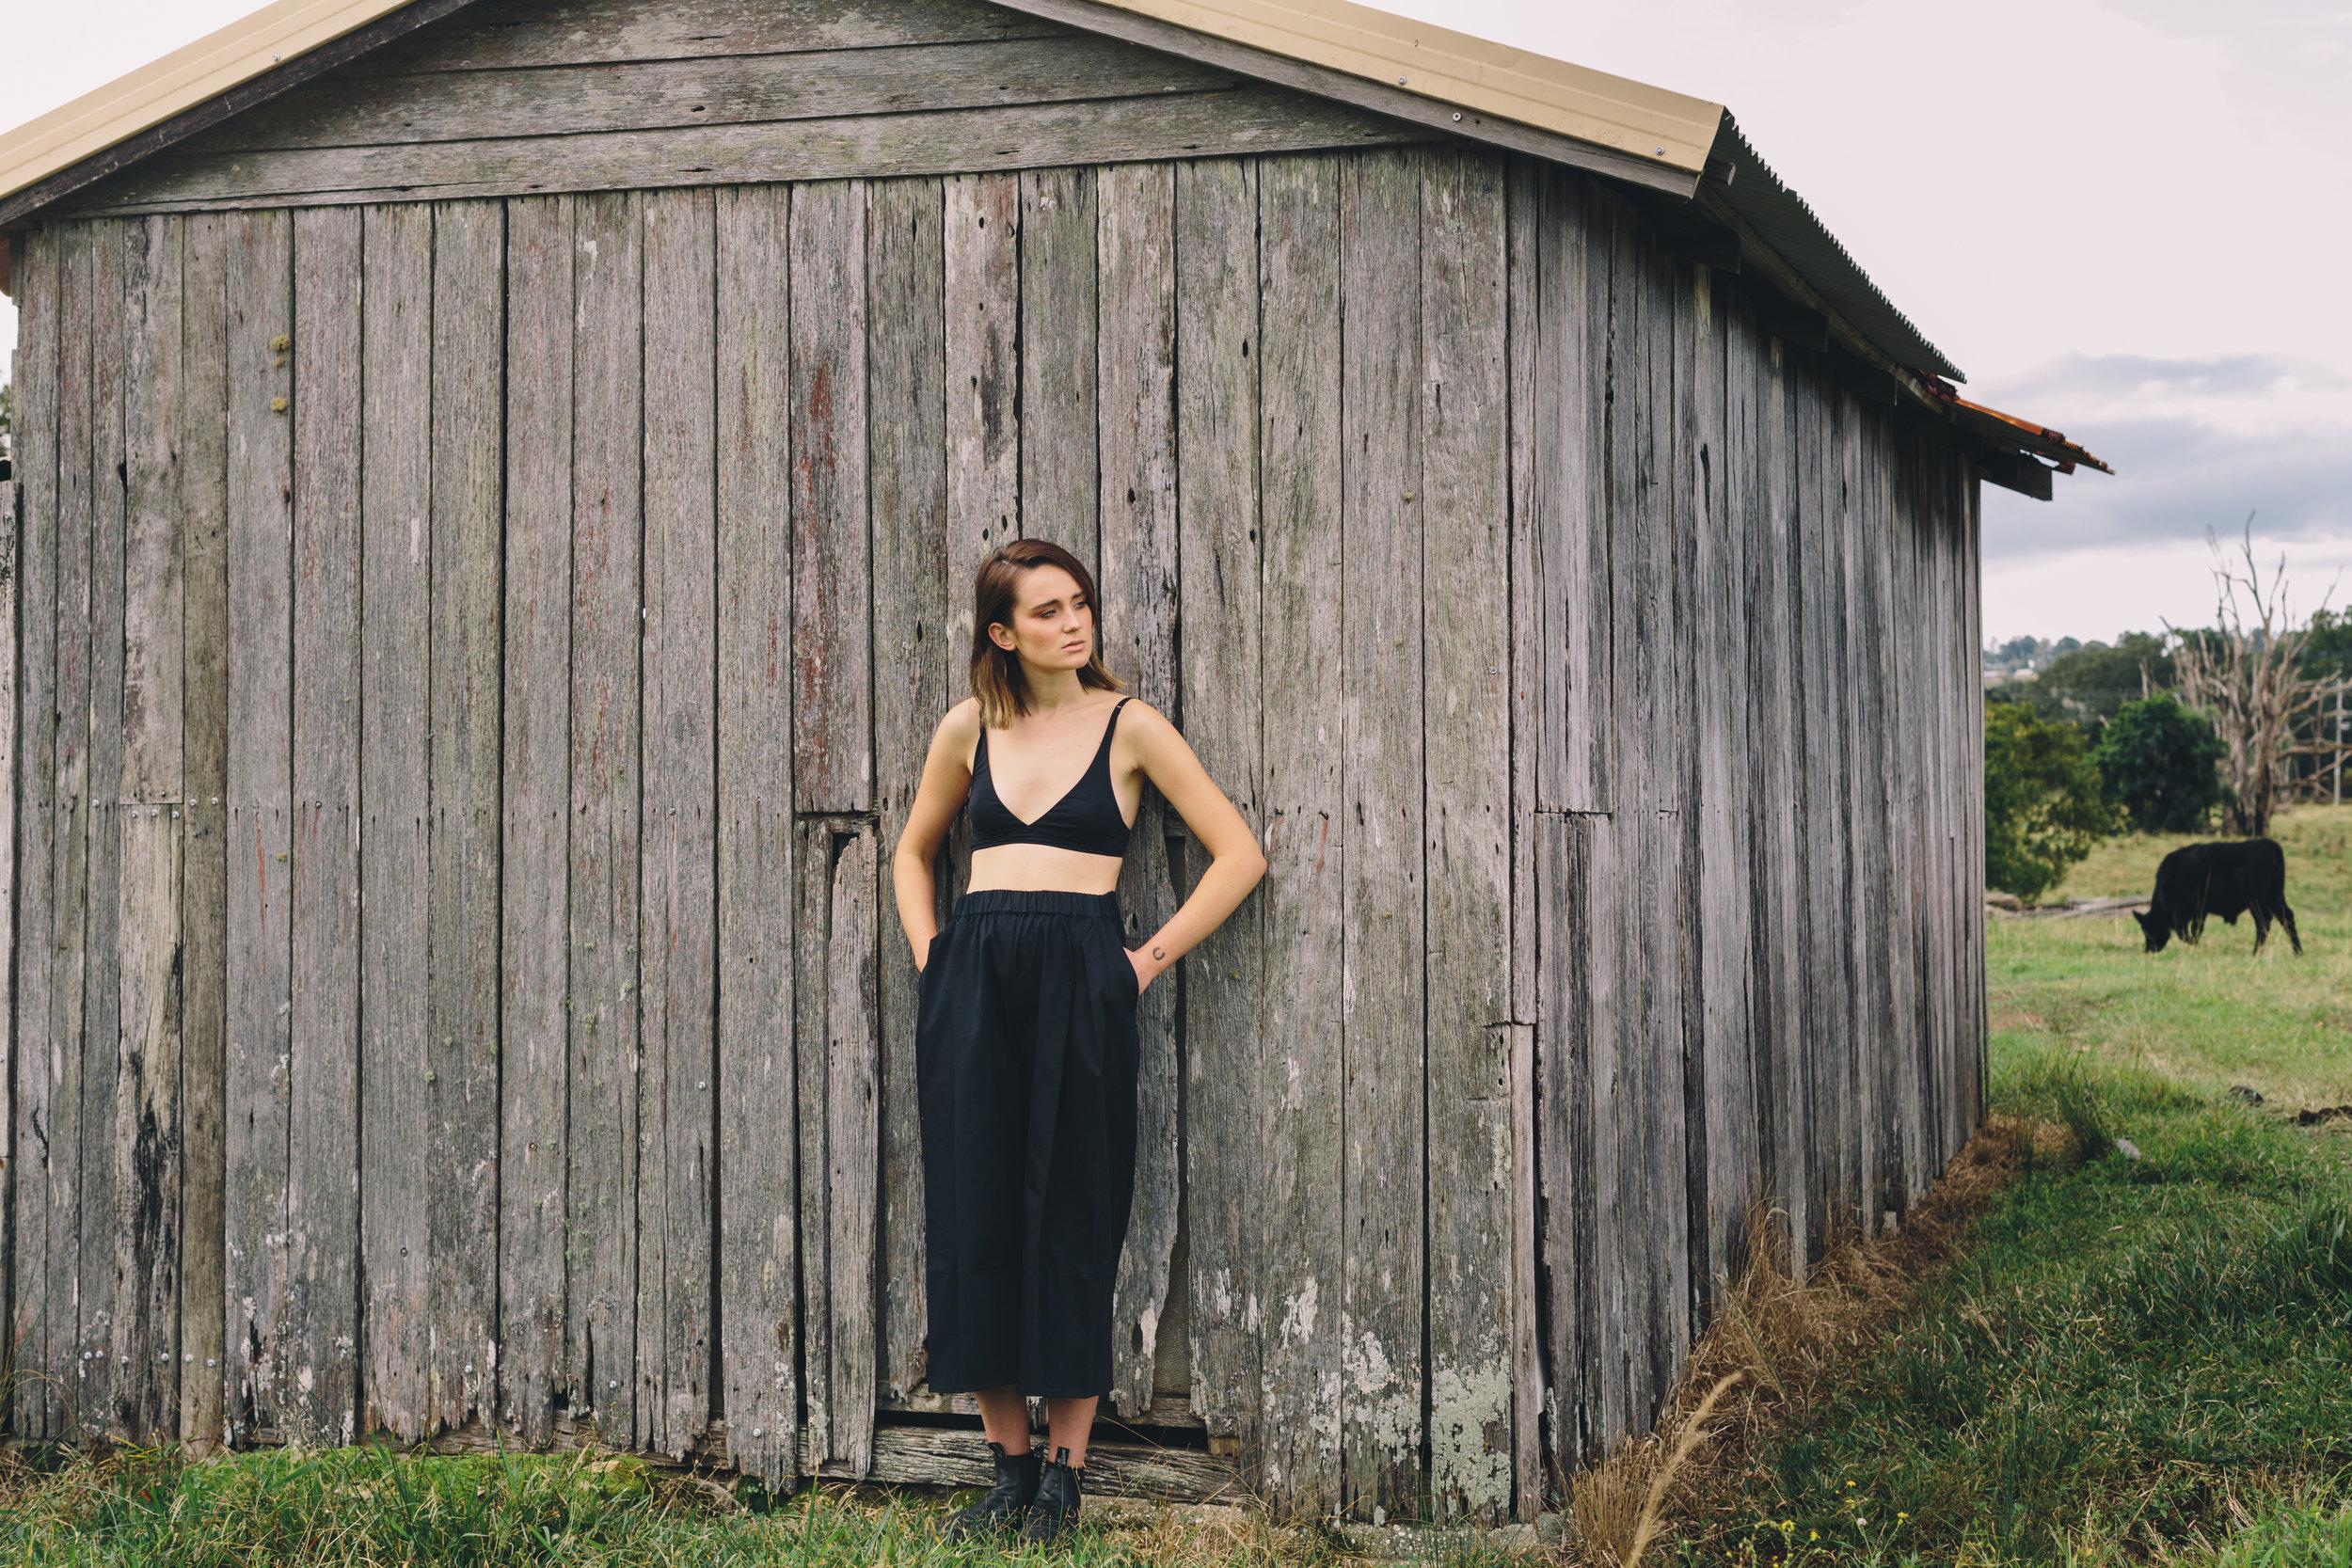 Melissa_Findley-ALTHAM-08